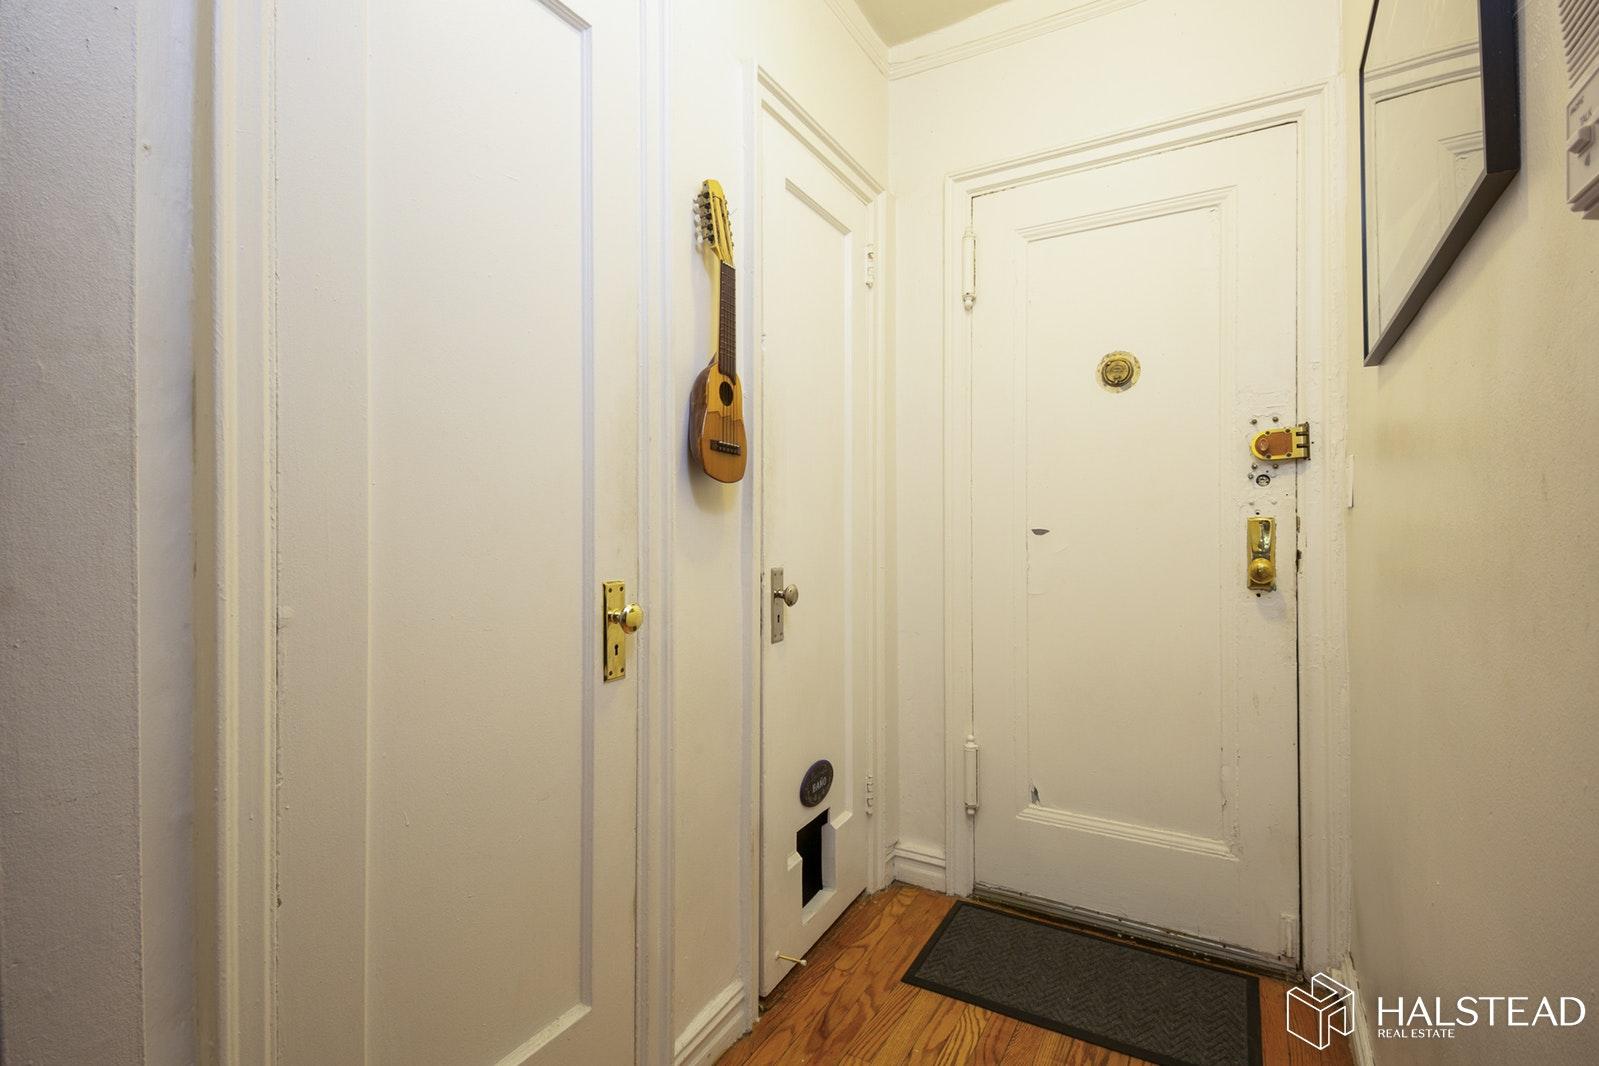 350 CABRINI BOULEVARD 2C, Washington Heights, $635,000, Web #: 19677502